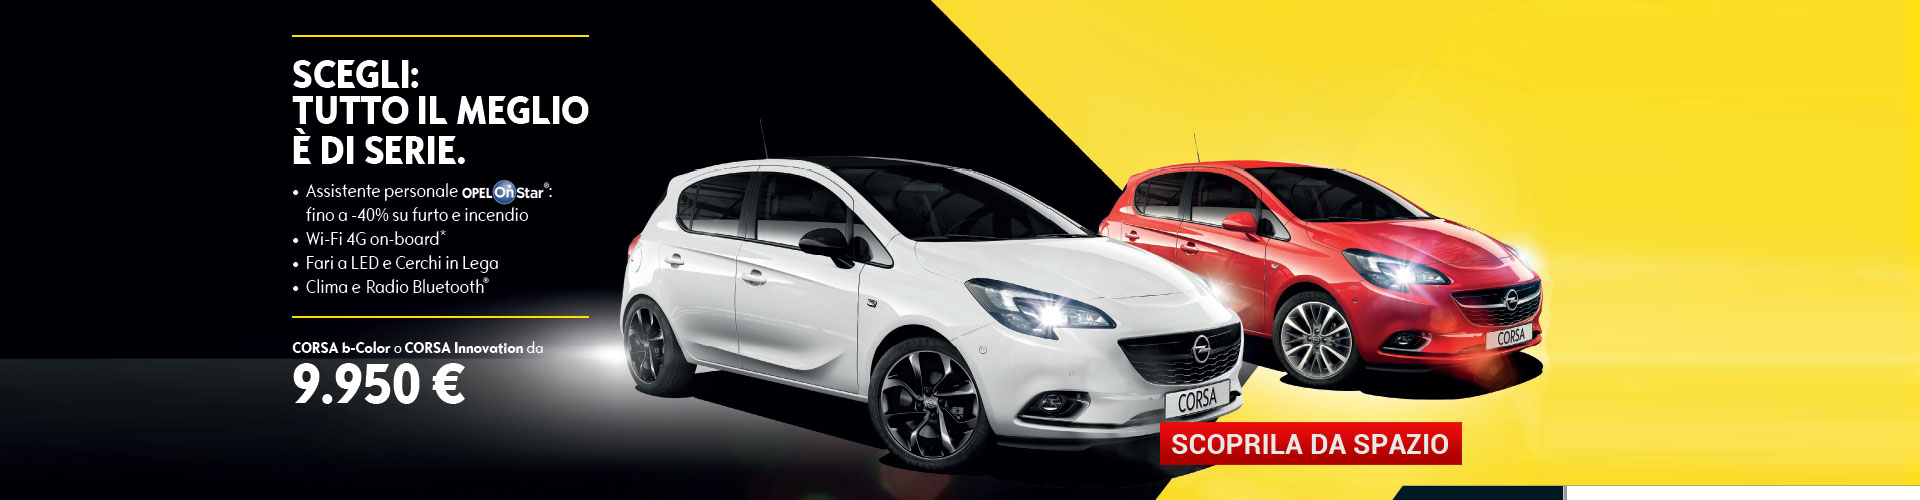 Opel Corsa b-Color e Innovation